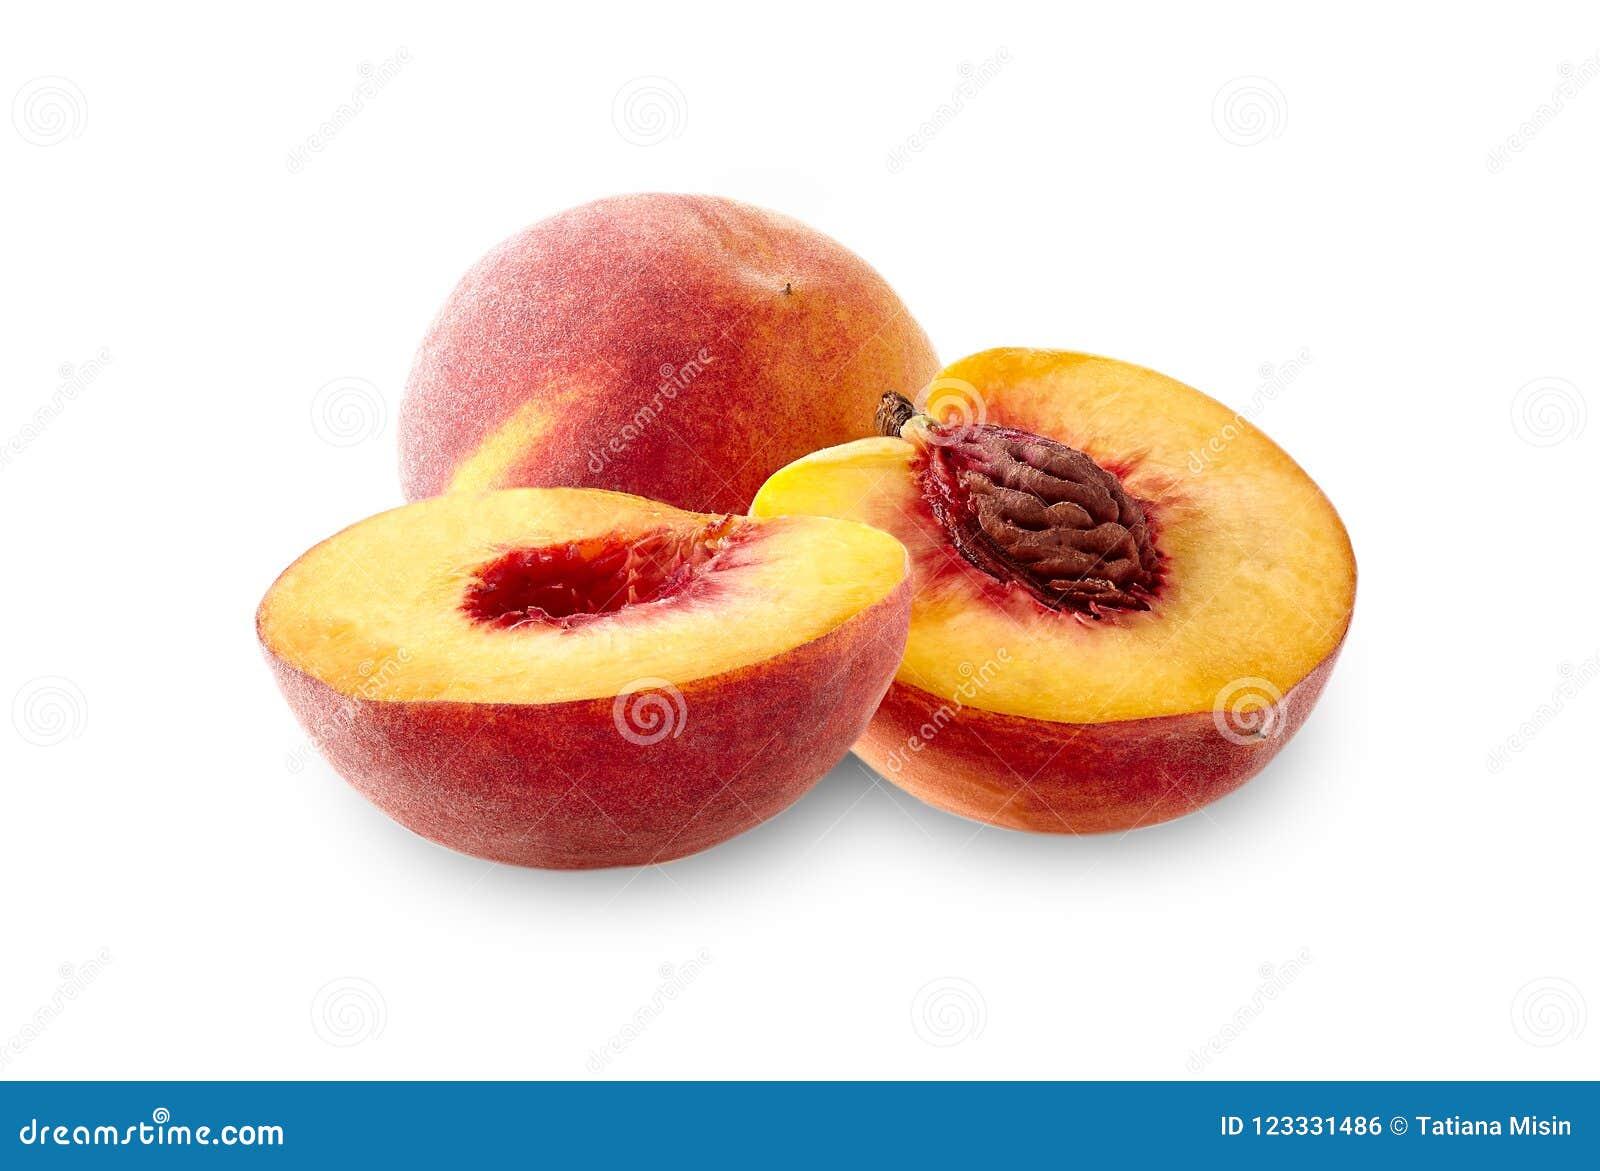 Peach with peach halves on white